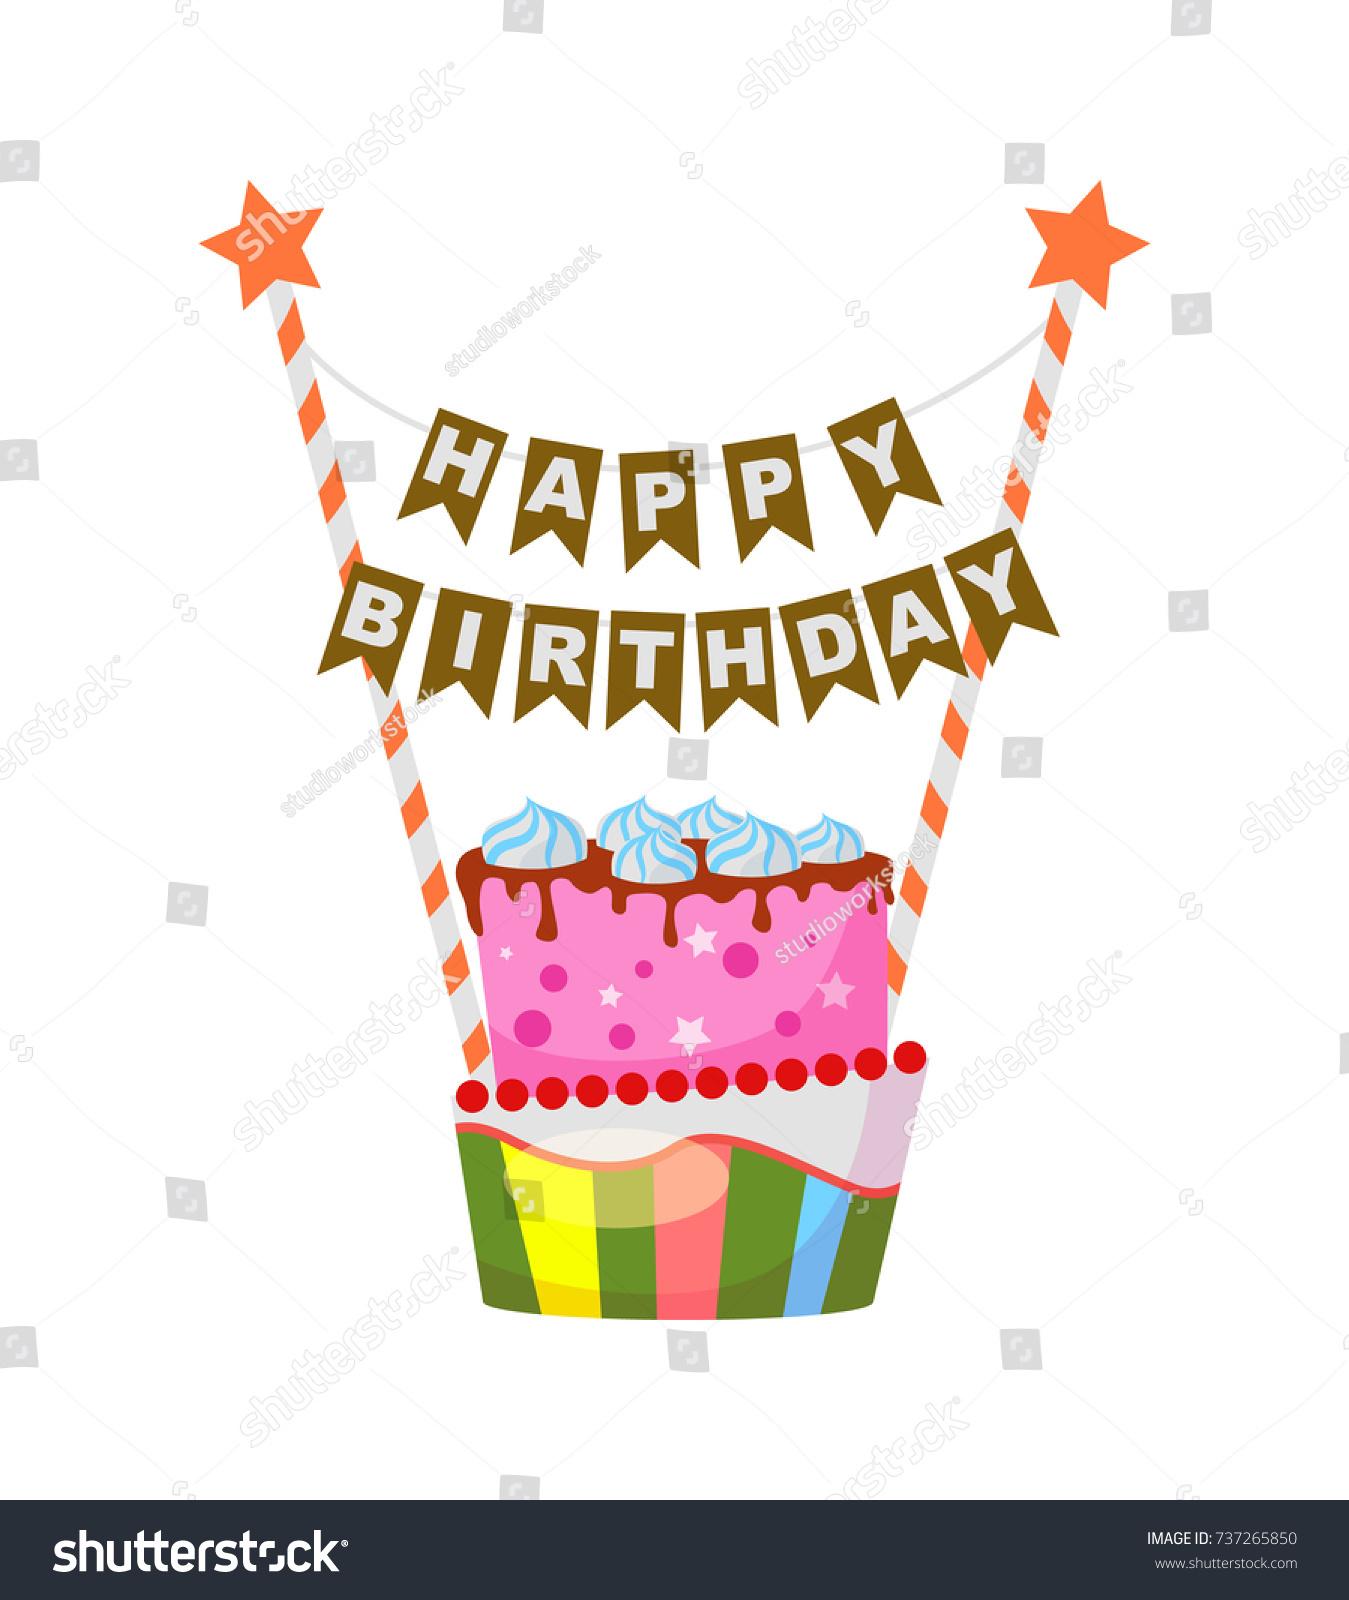 Birthday cake cartoon style holiday congratulation stock vector birthday cake in cartoon style holiday congratulation element event decoration object children party biocorpaavc